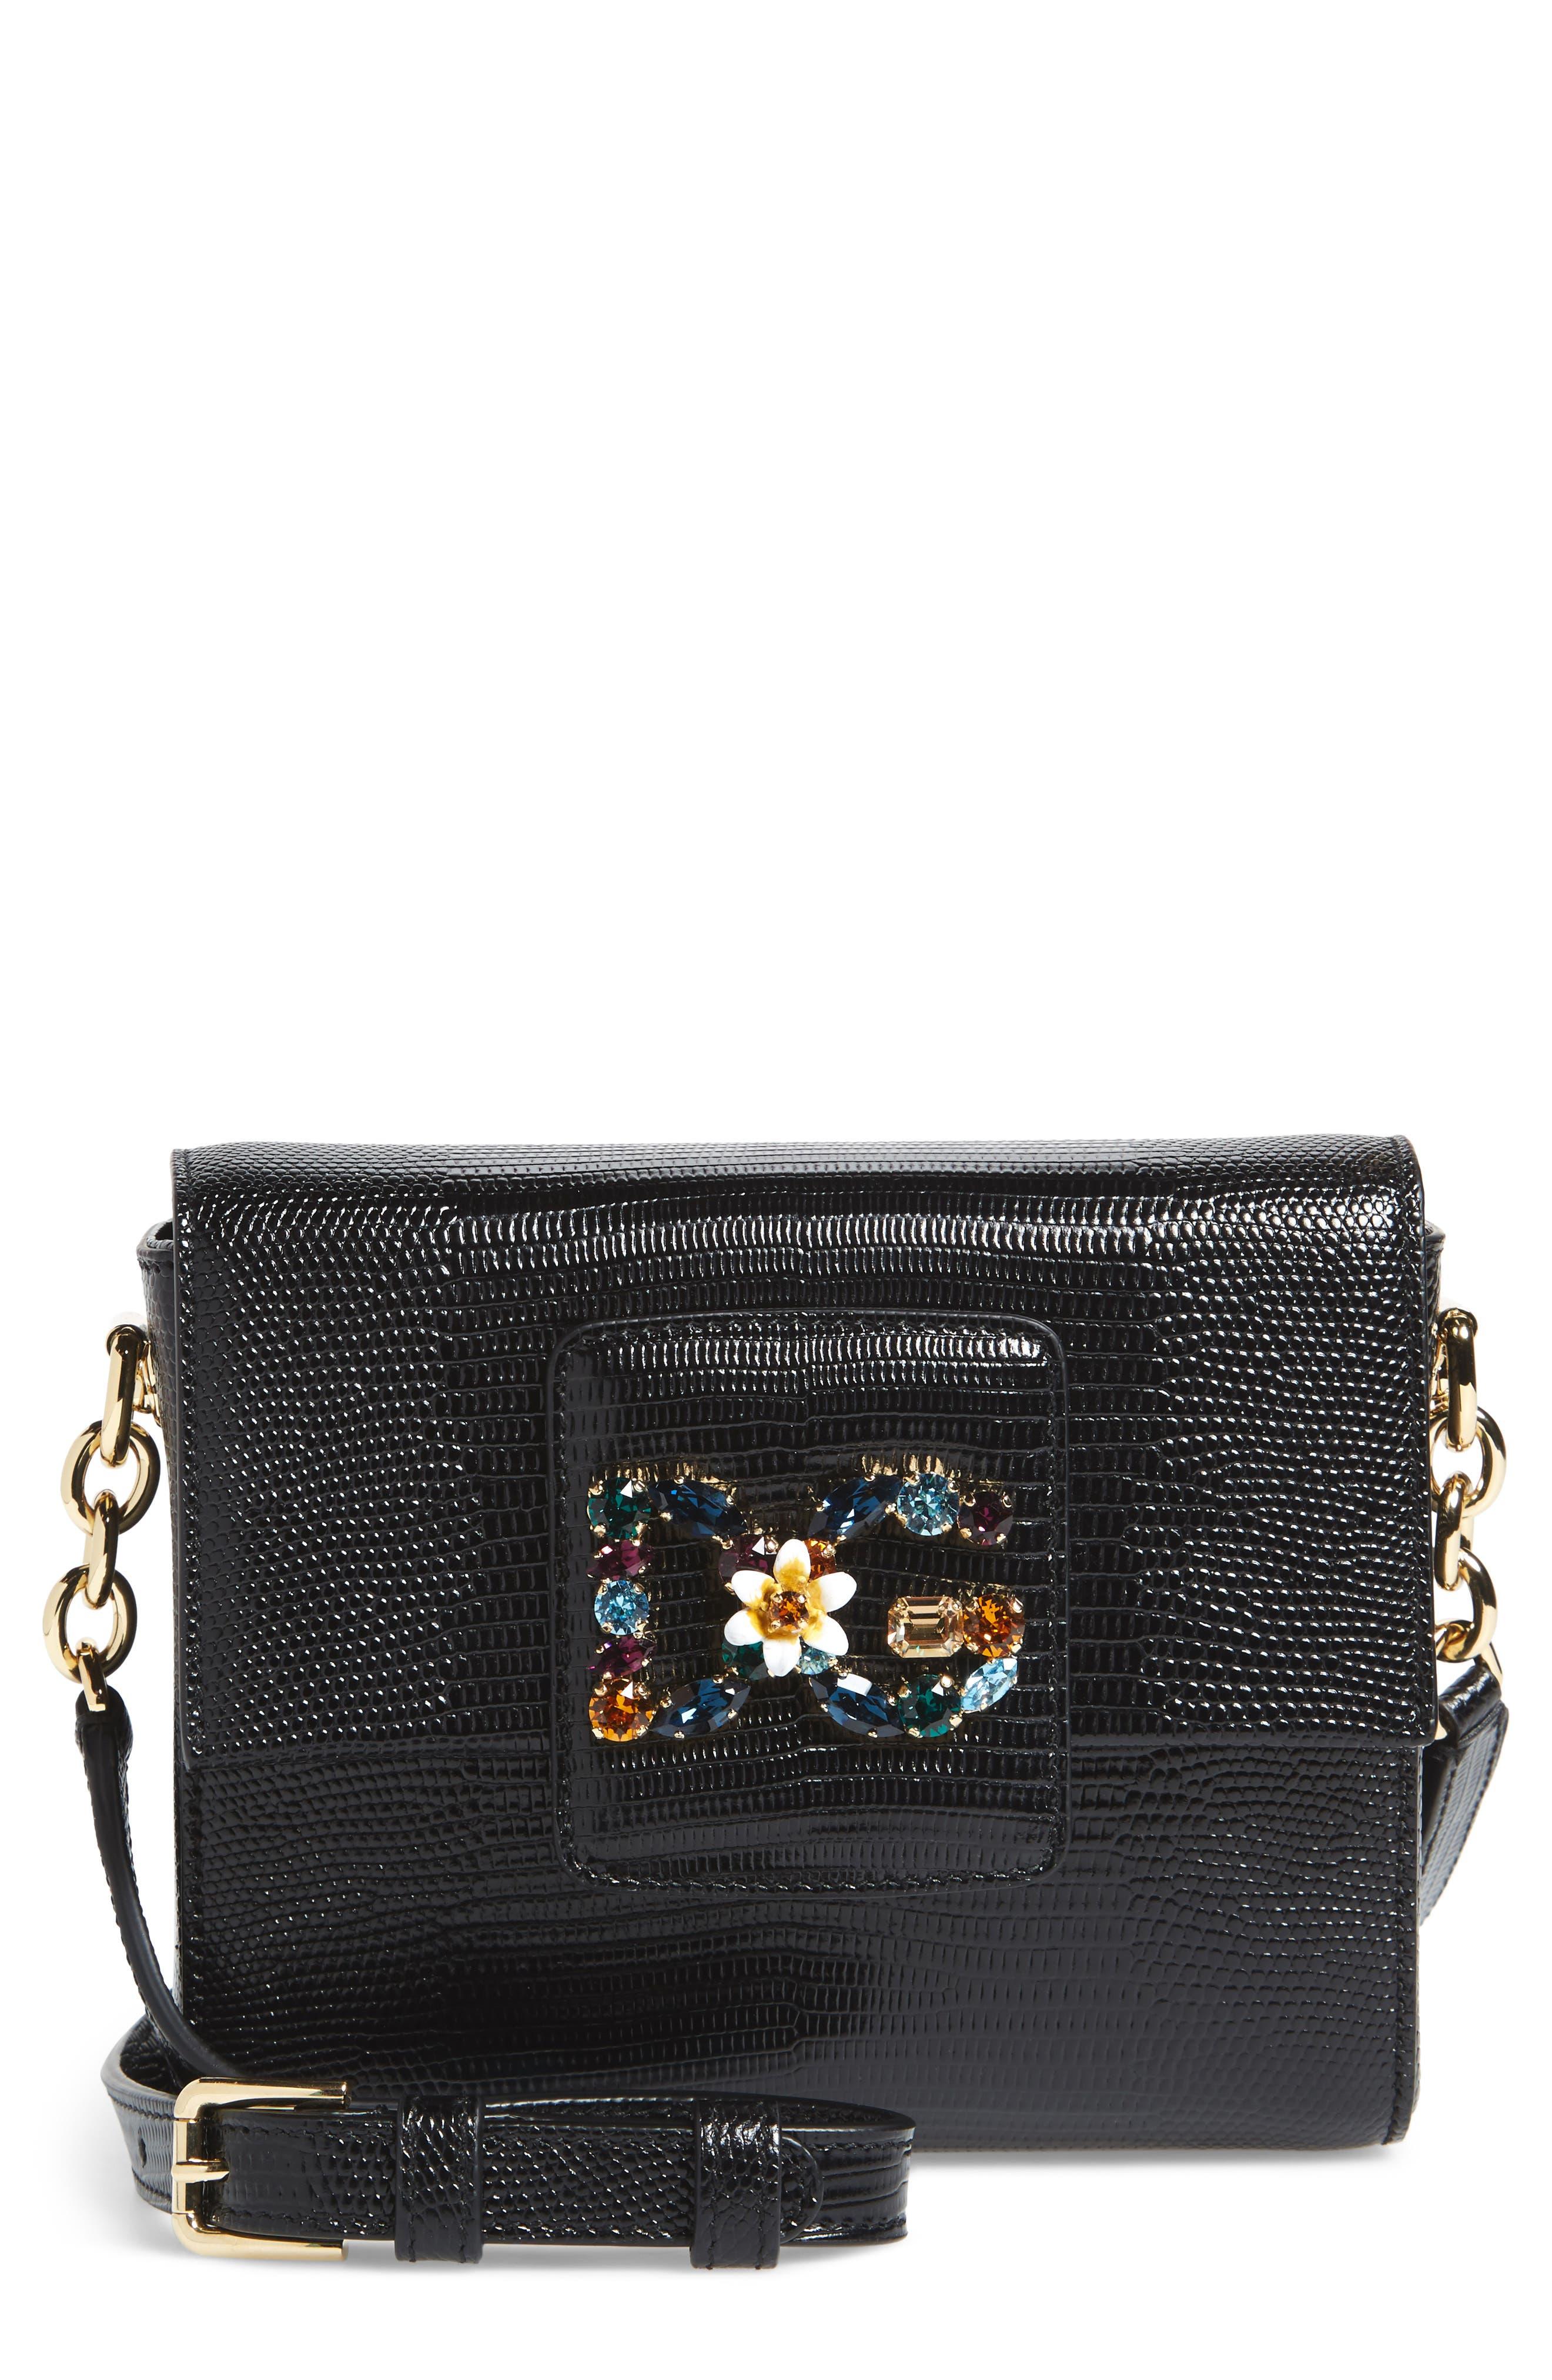 Alternate Image 1 Selected - Dolce&Gabbana Millennial Reptile Embossed Leather Crossbody Bag